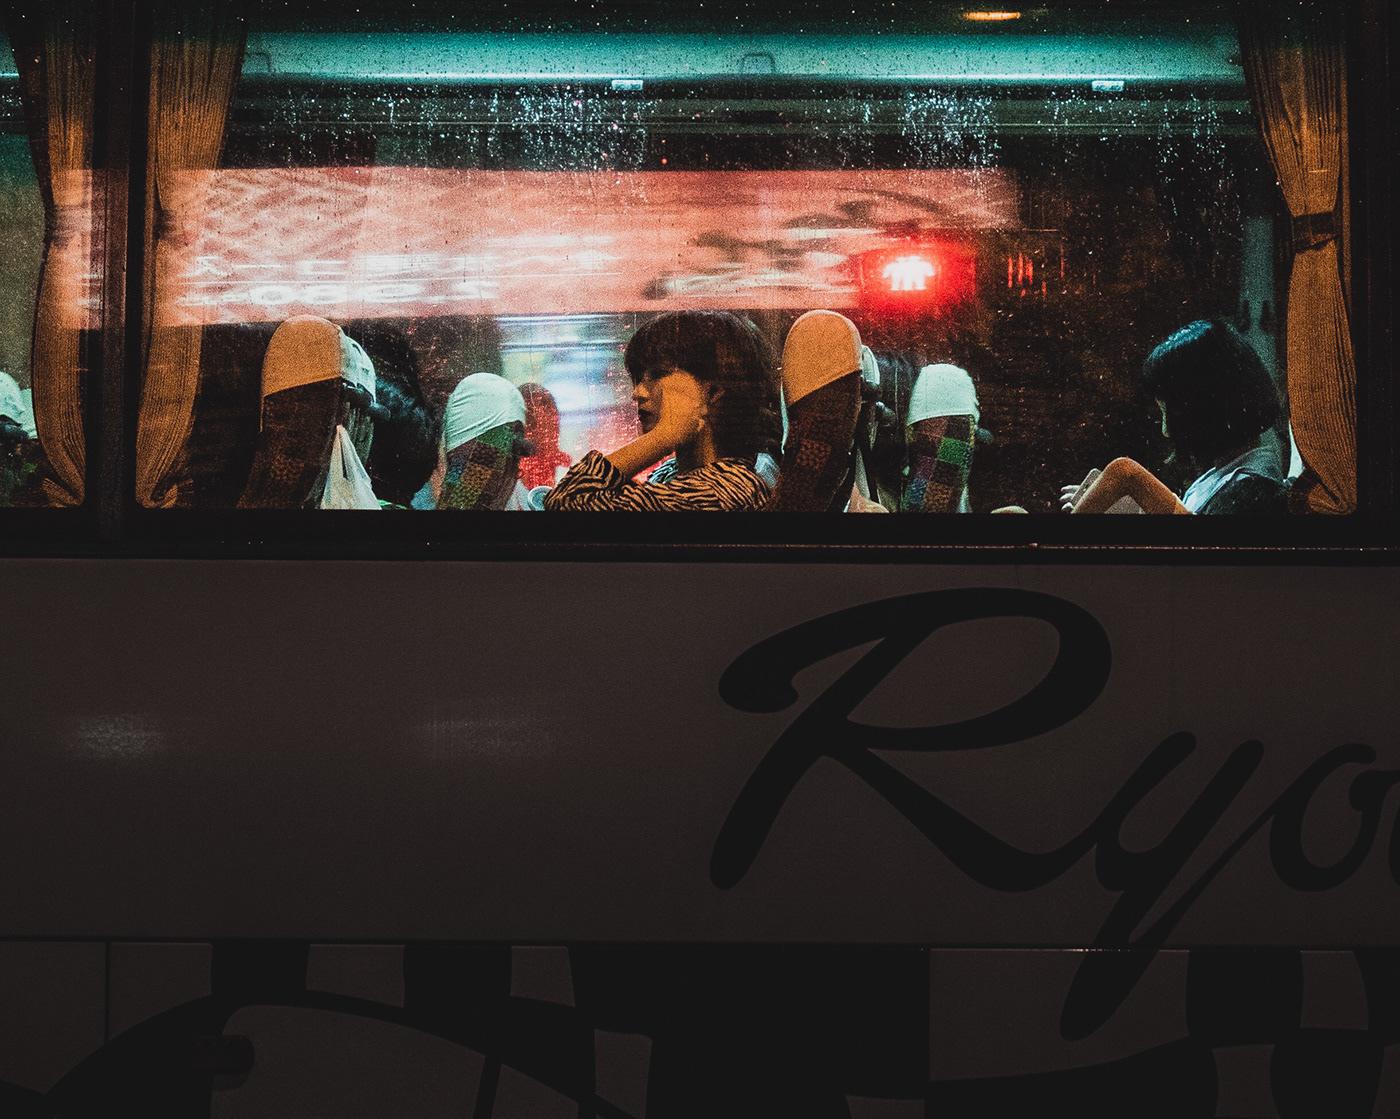 Art Director cinematic city japan night night photography Photography  rain streetphotography Urban